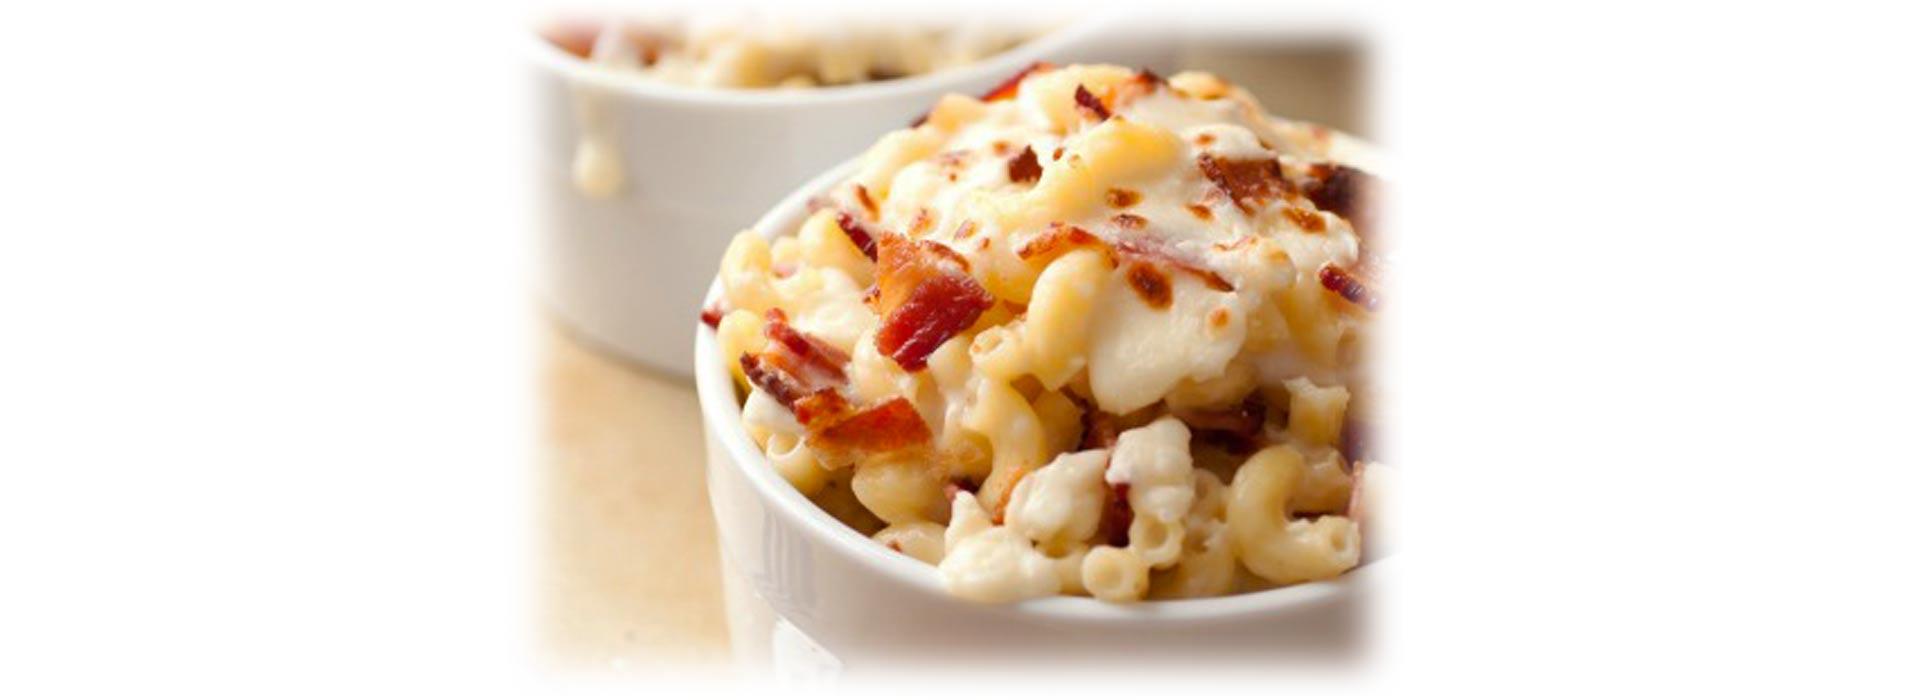 Bacon Feta Mac and Cheese